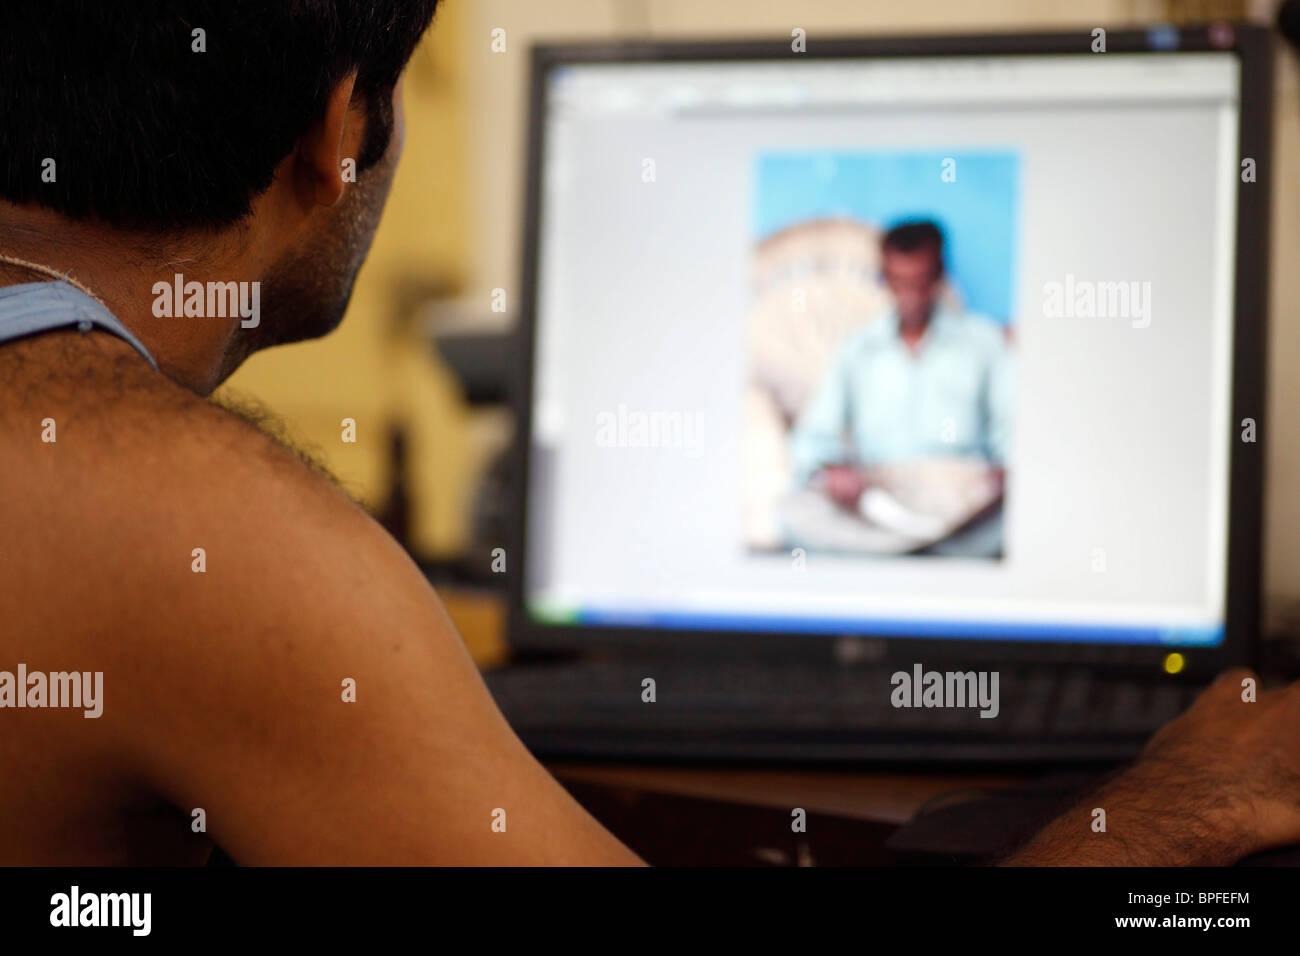 A photographers monitors his digital image processing. - Stock Image